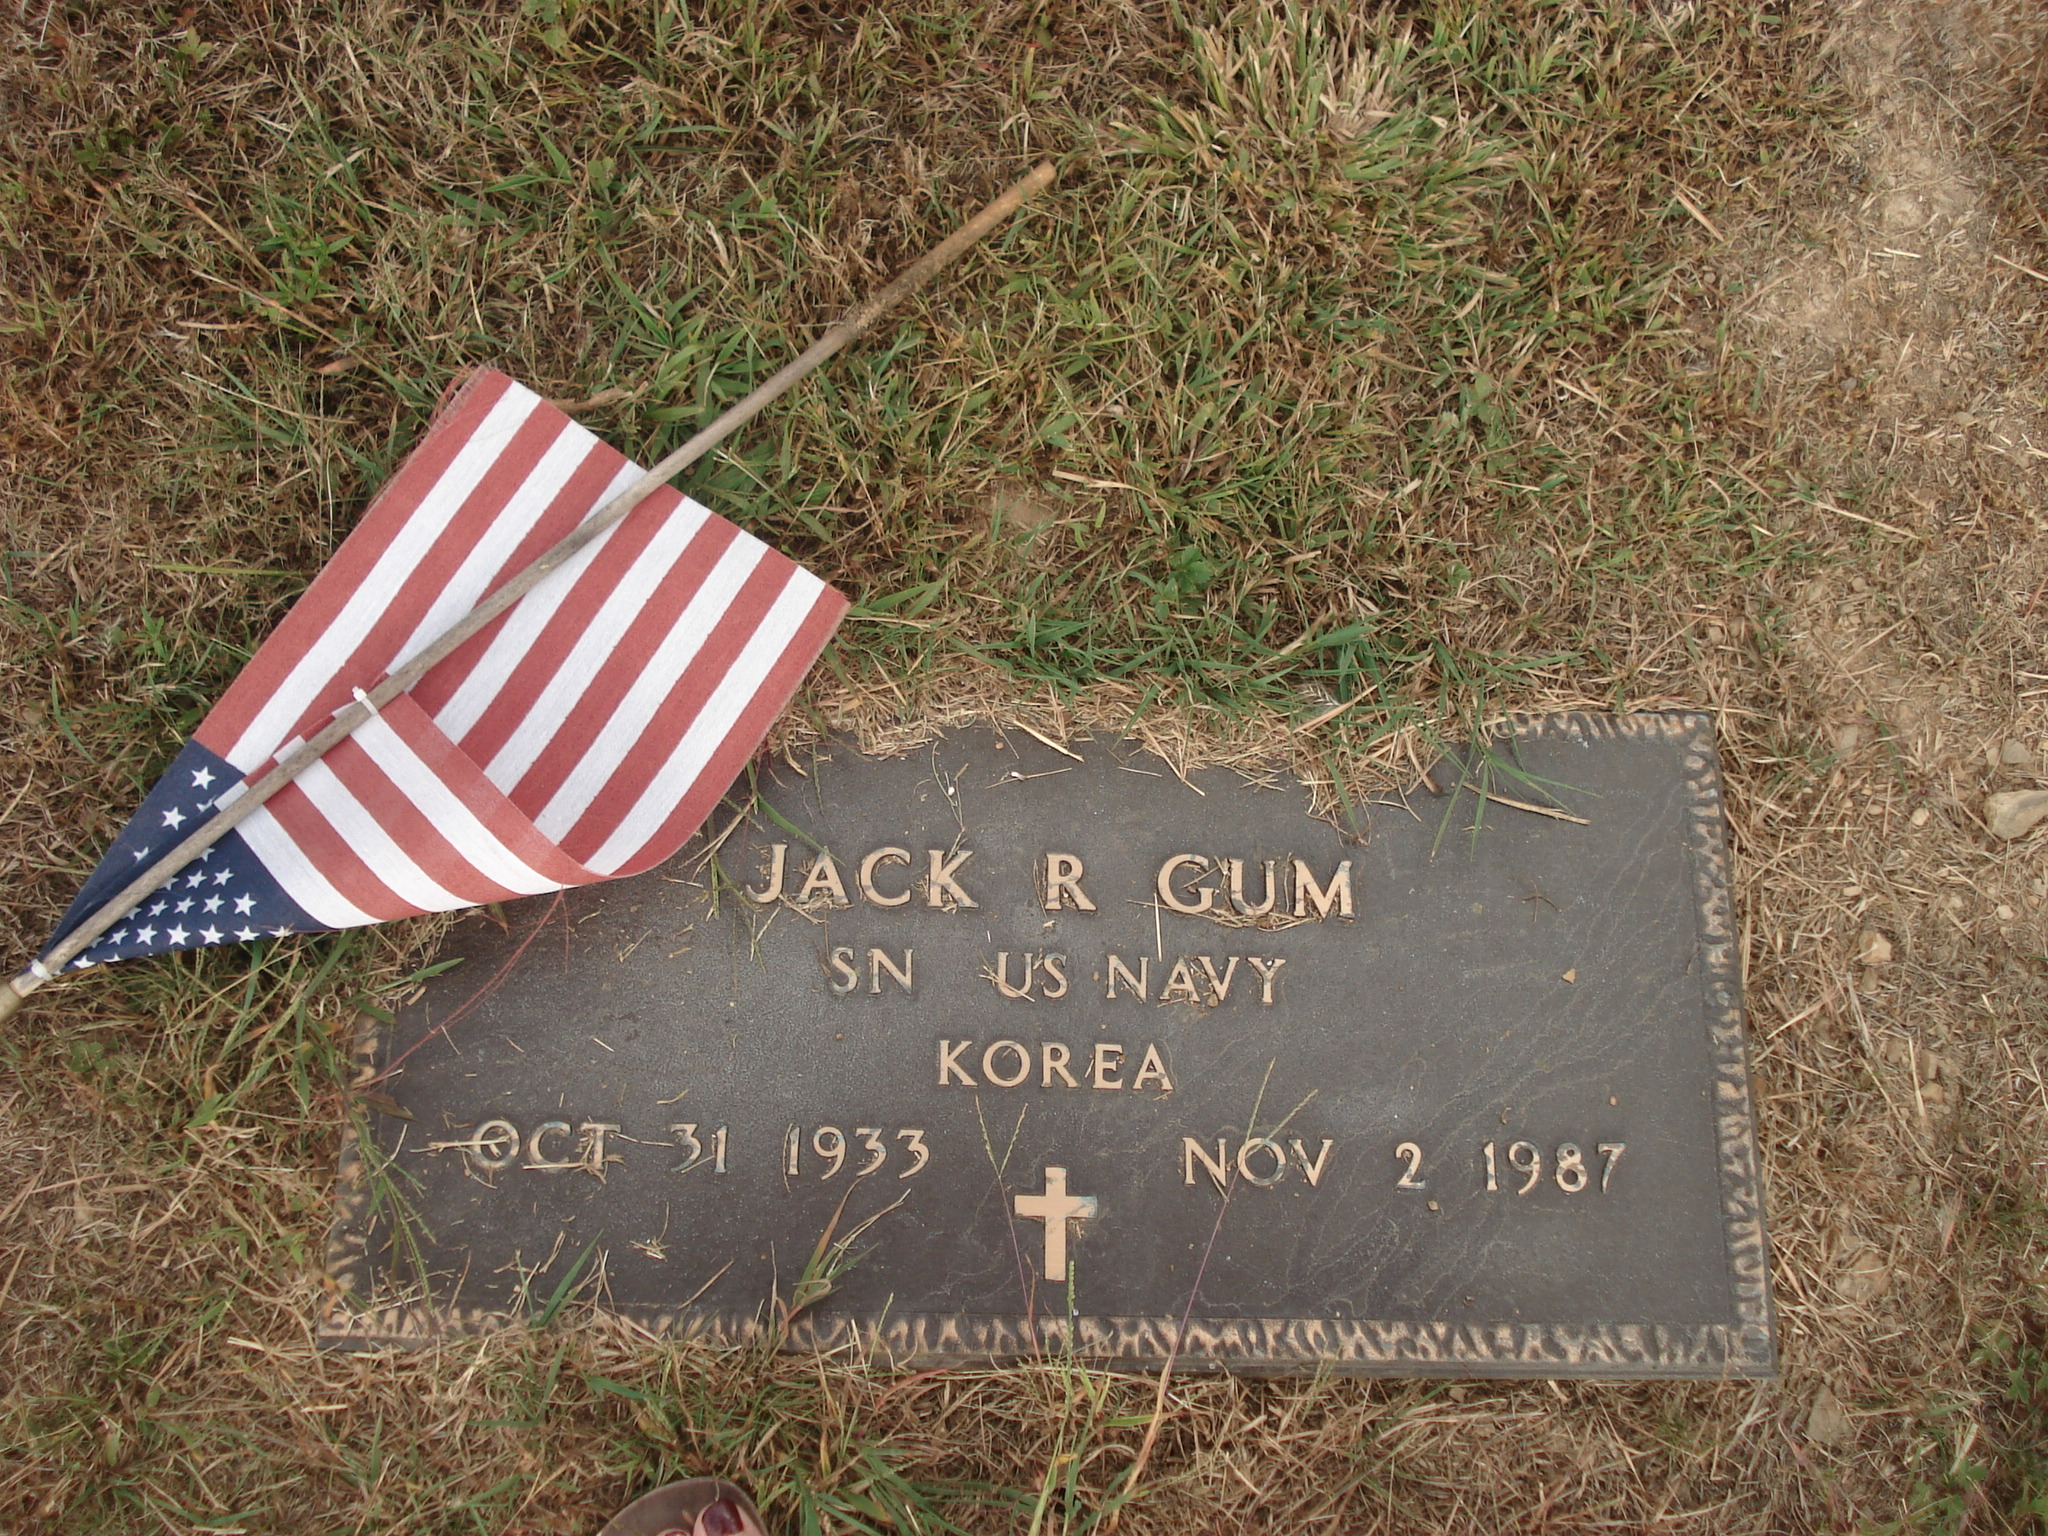 Jackie Raymond John Gum